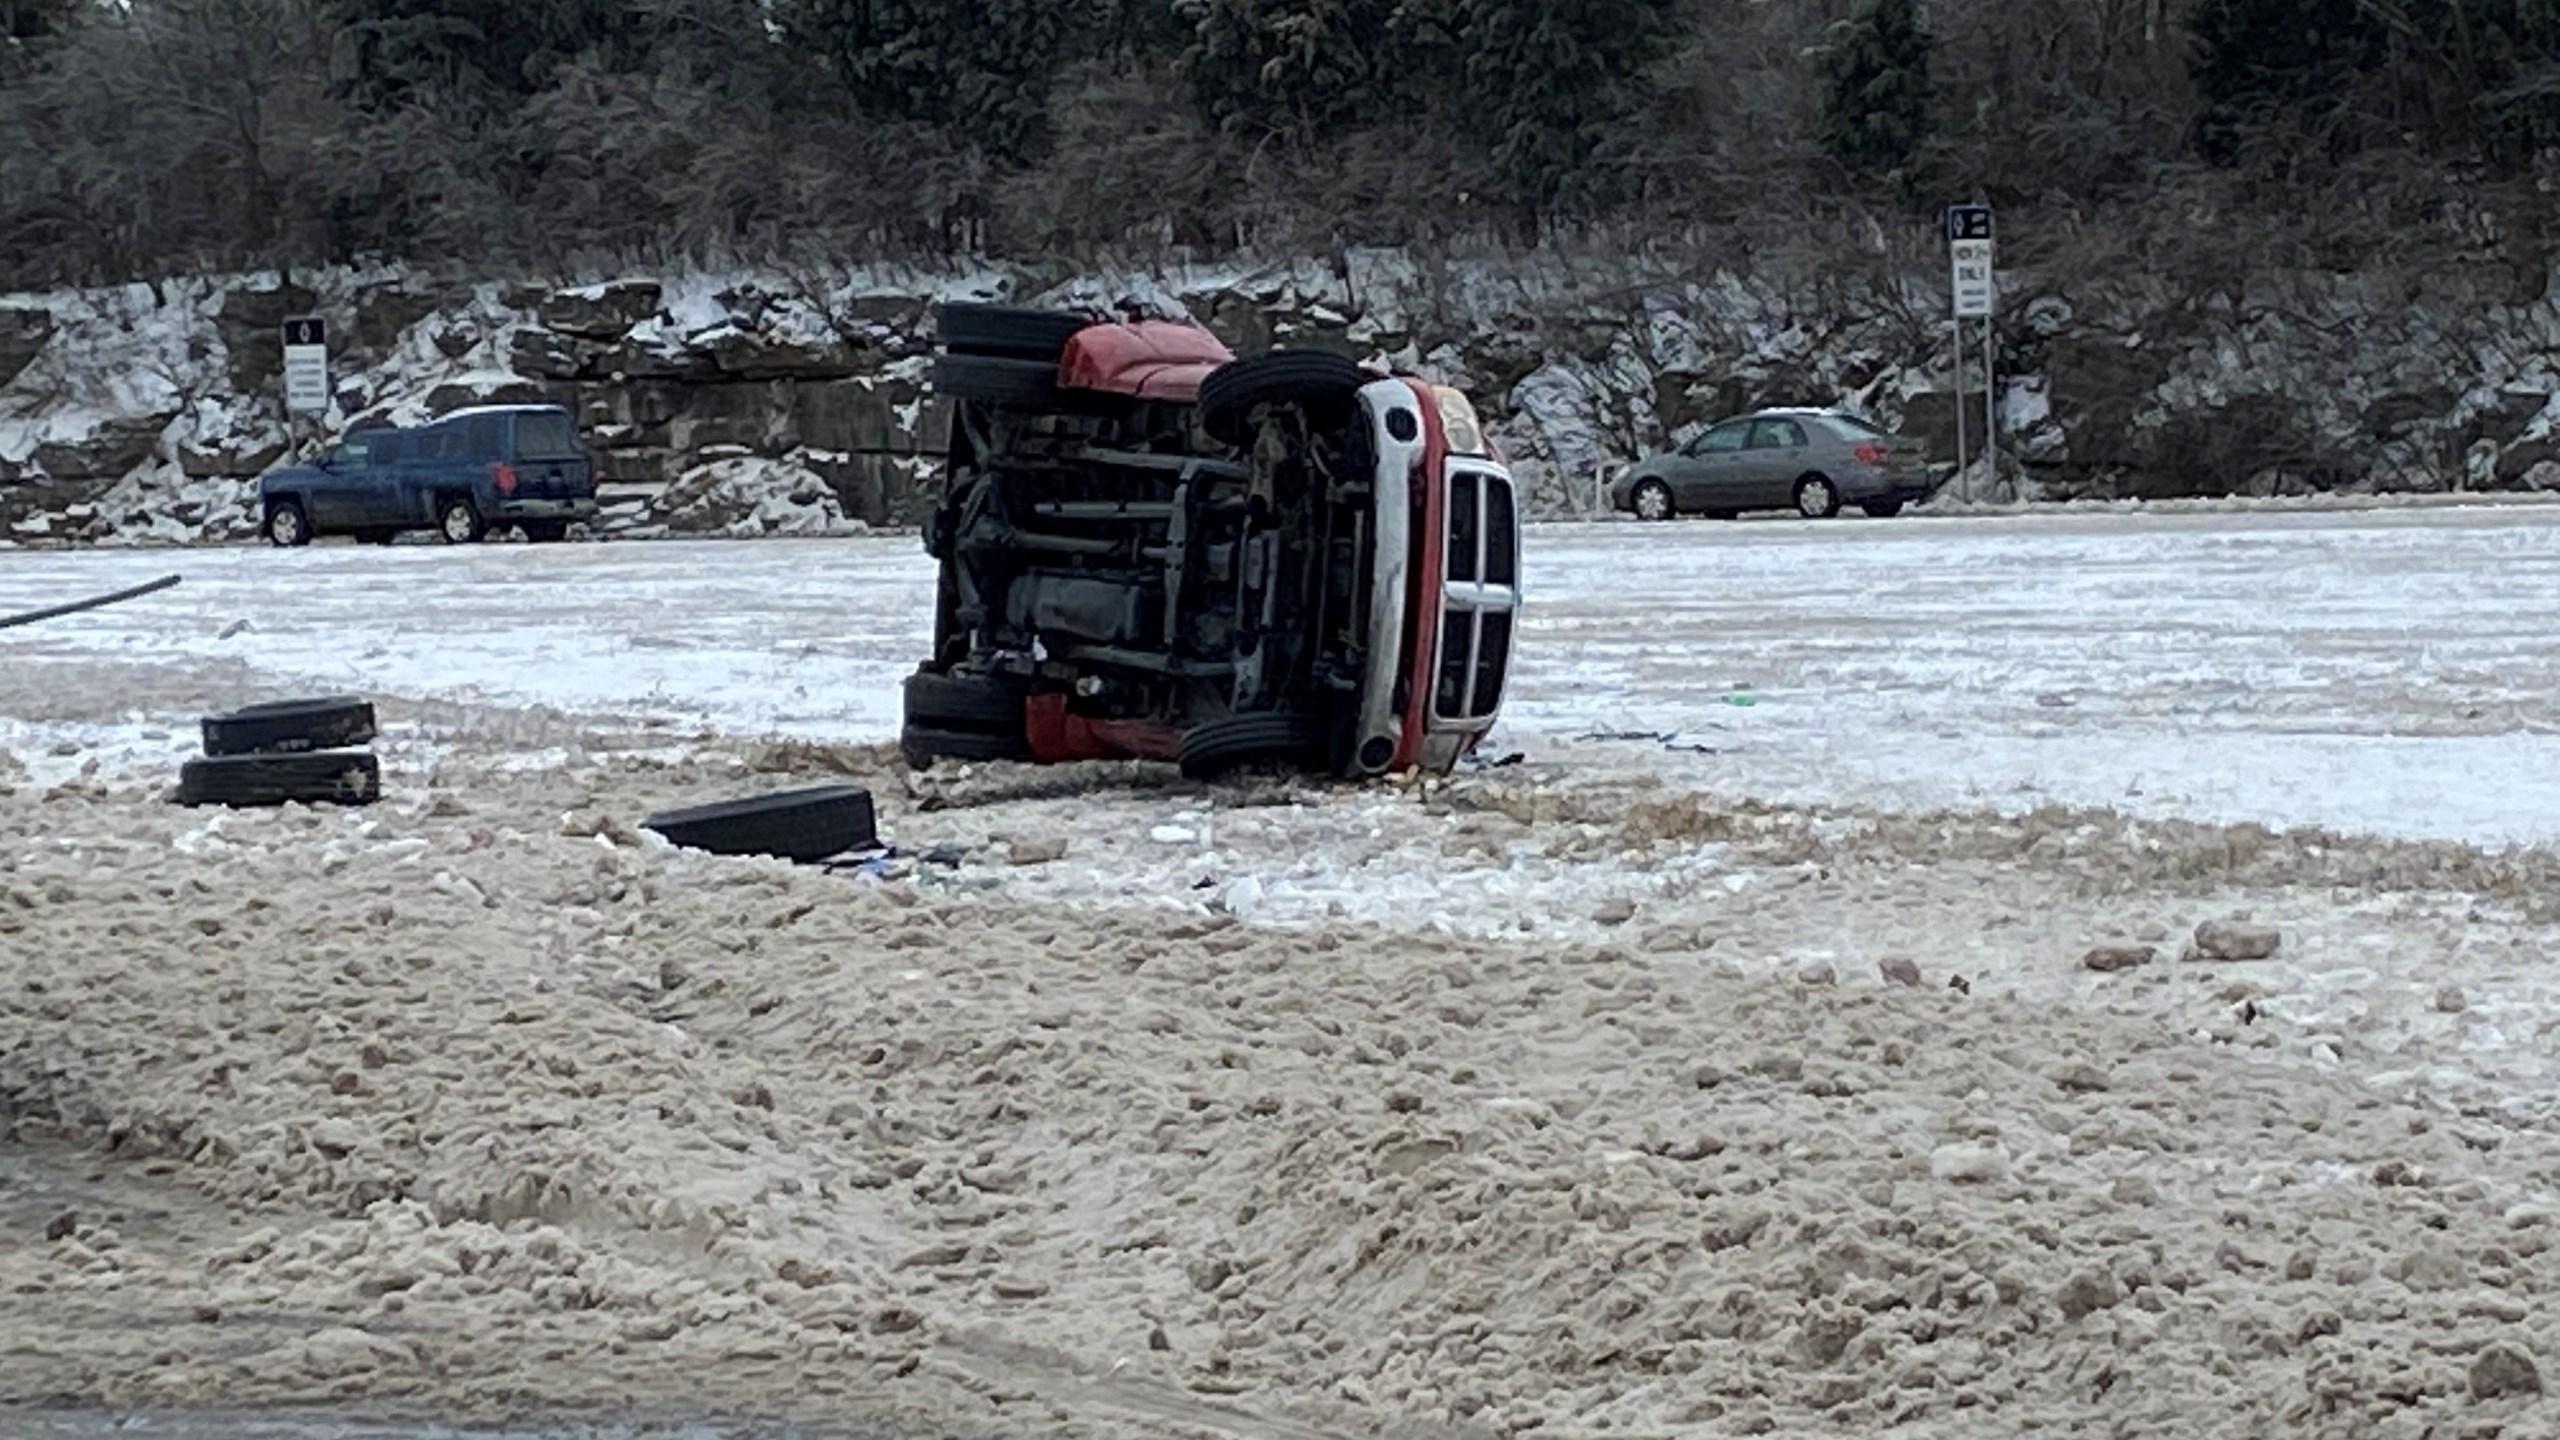 I-24 Rollover Crash near Haywood Ln on 2-16-2021